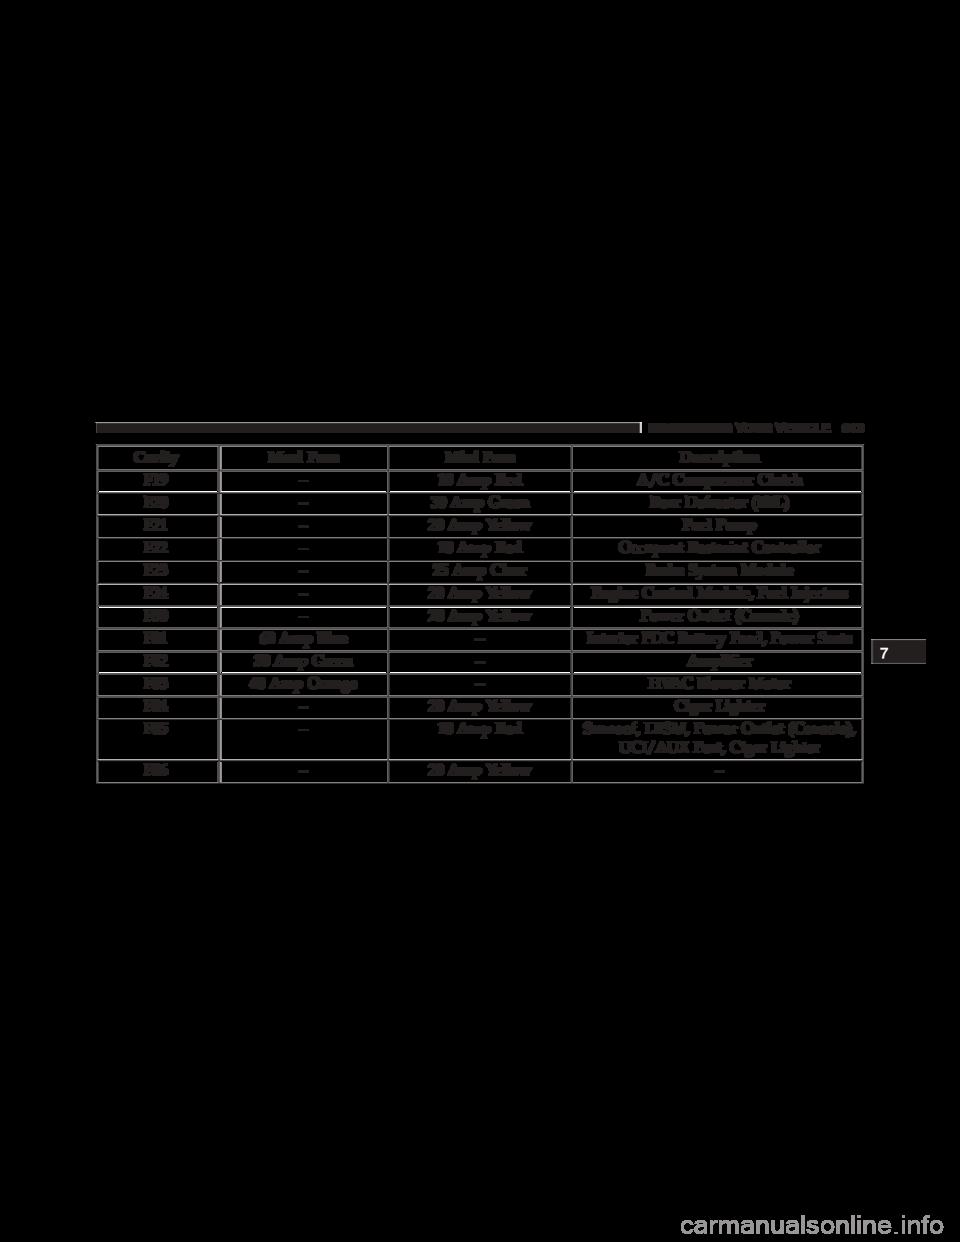 2012 hyundai santa fe trailer wiring diagram  hyundai